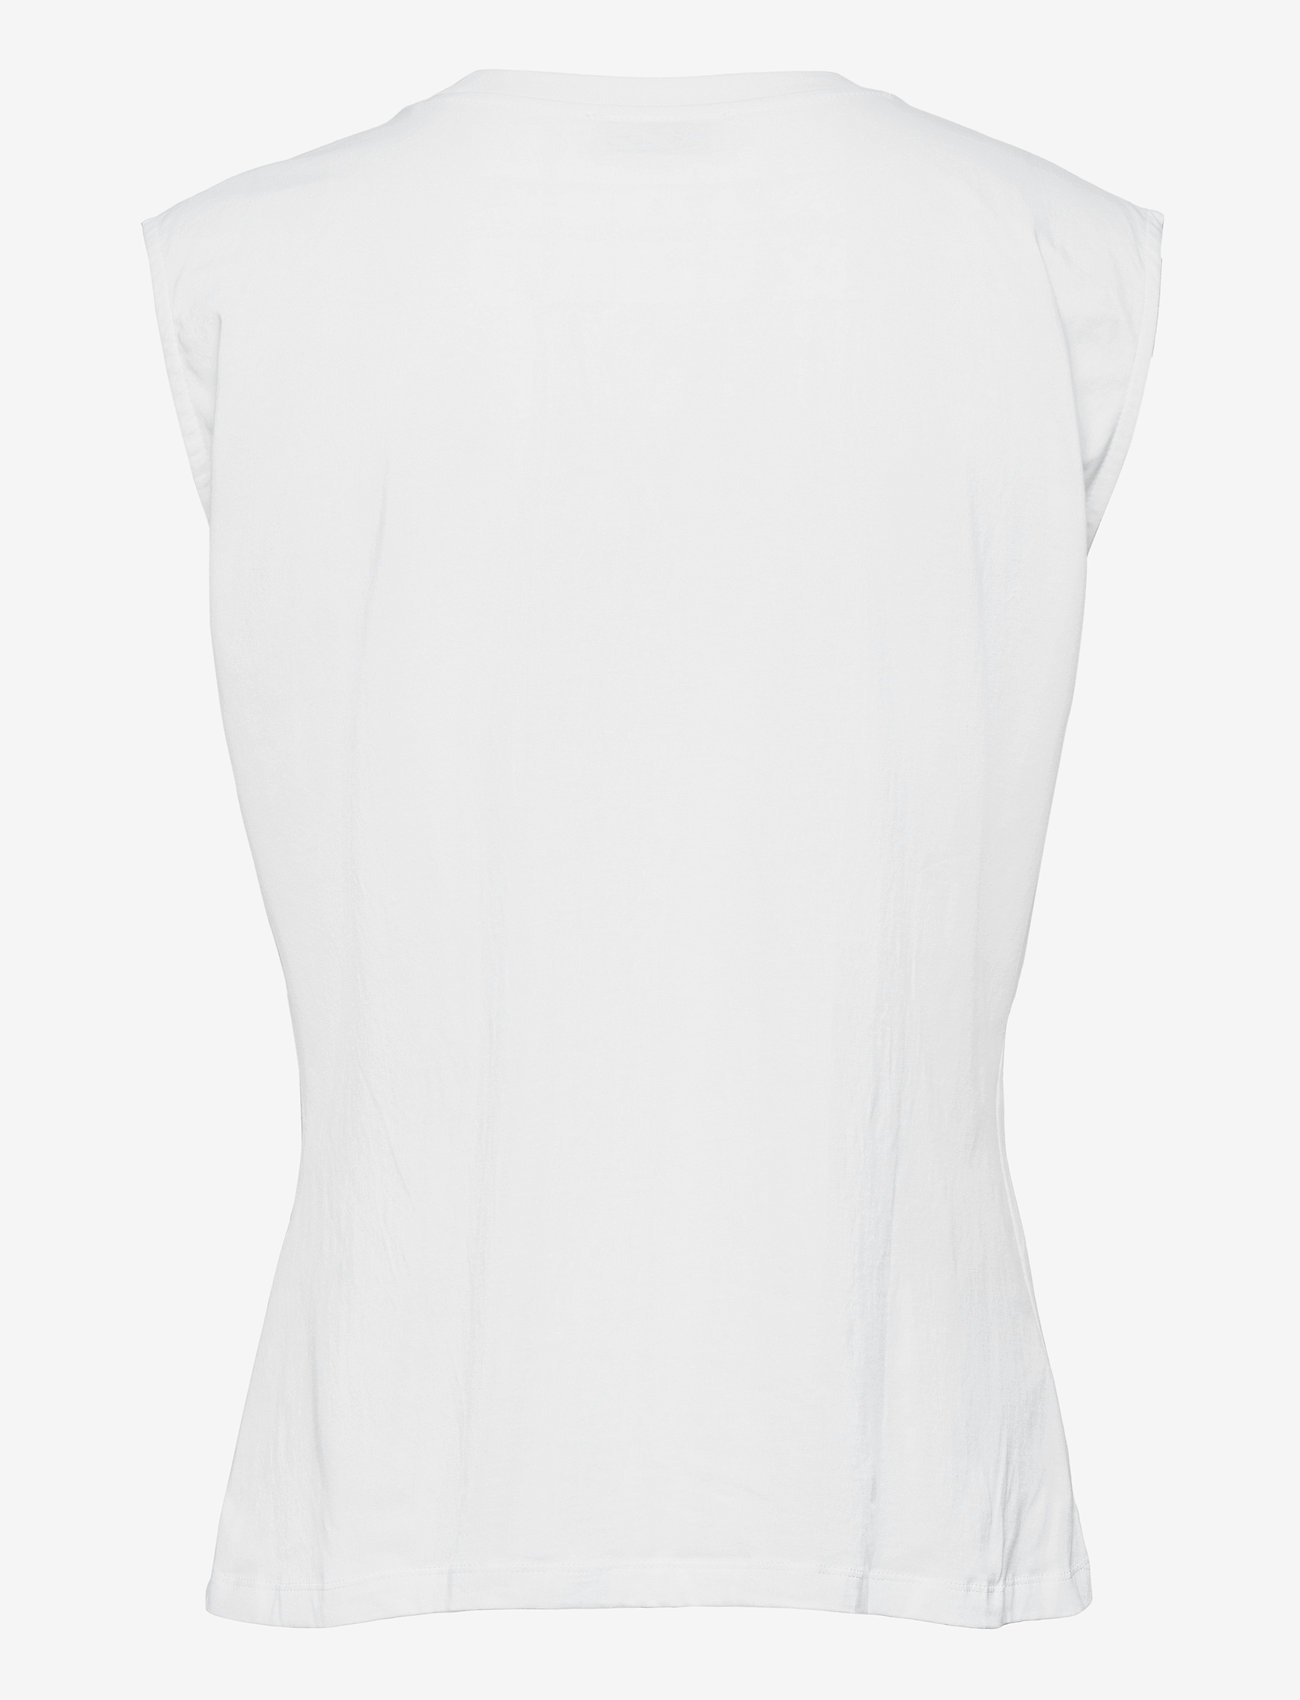 NORR - Augustin top - sleeveless blouses - white - 1